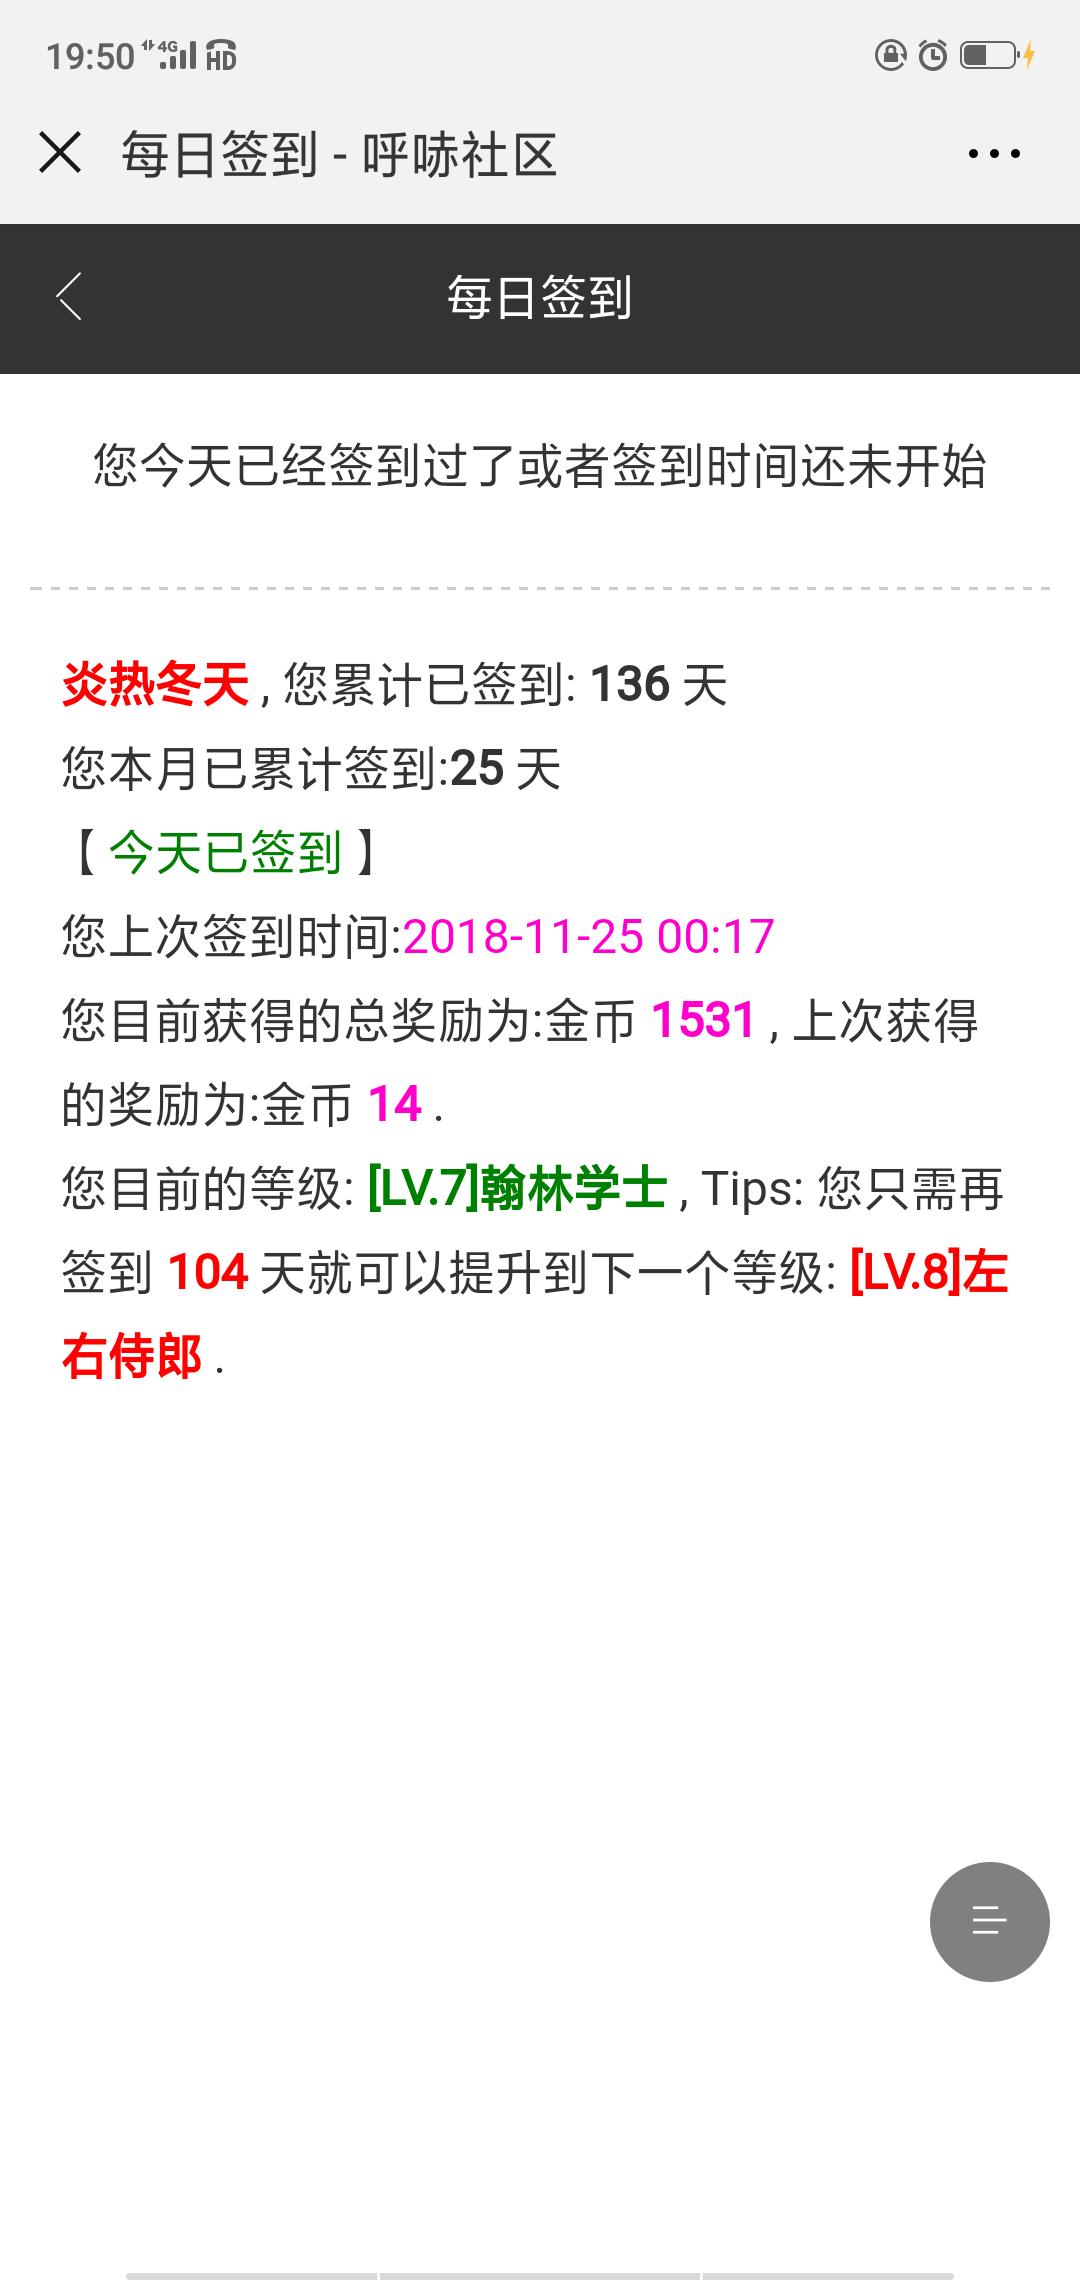 Screenshot_2018-11-25-19-50-07-44.png